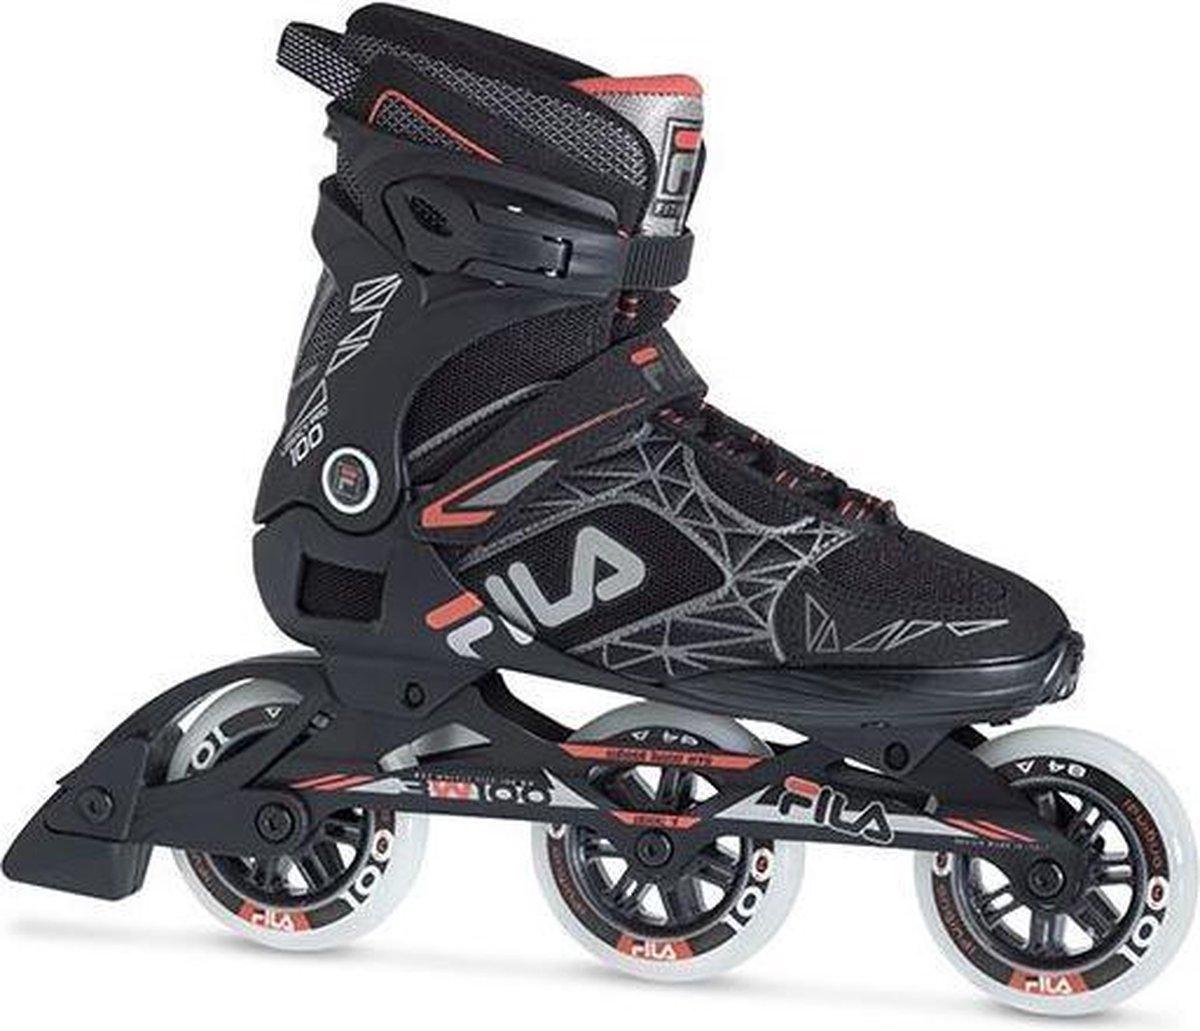 Fila Legacy pro inline skates 100 mm black red Maat 43